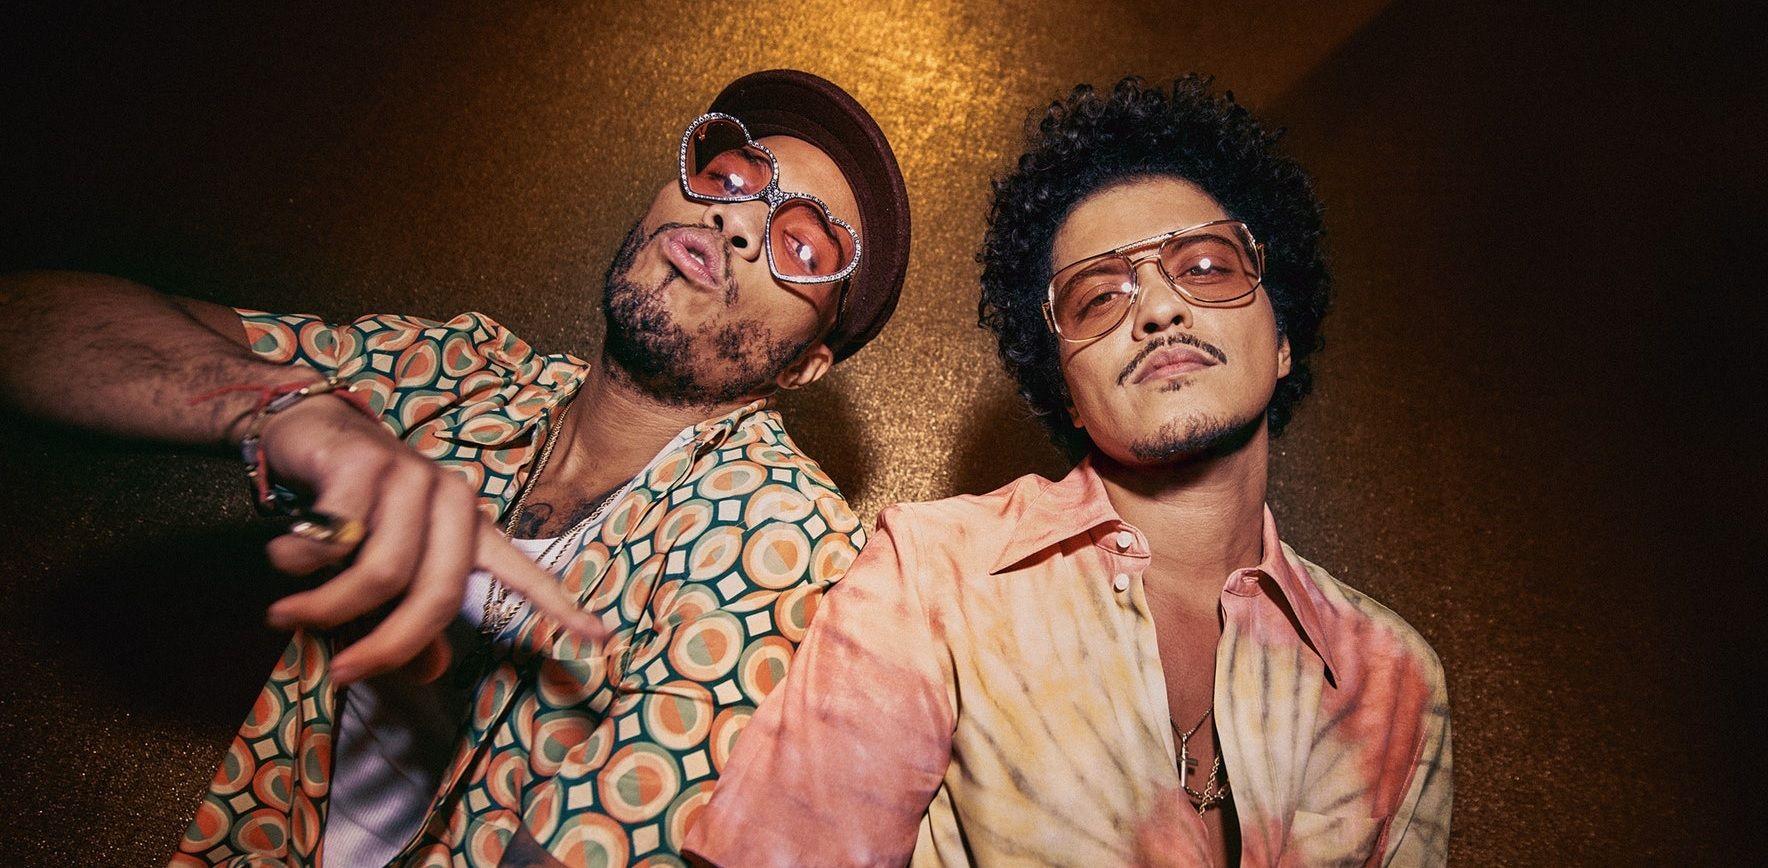 "Bruno Mars กับ Anderson .Paak เปิดตัวโปรเจกต์ใหม่ Silk Sonic ปล่อยมิวสิกวีดีโอ ""Leave the Door Open"""